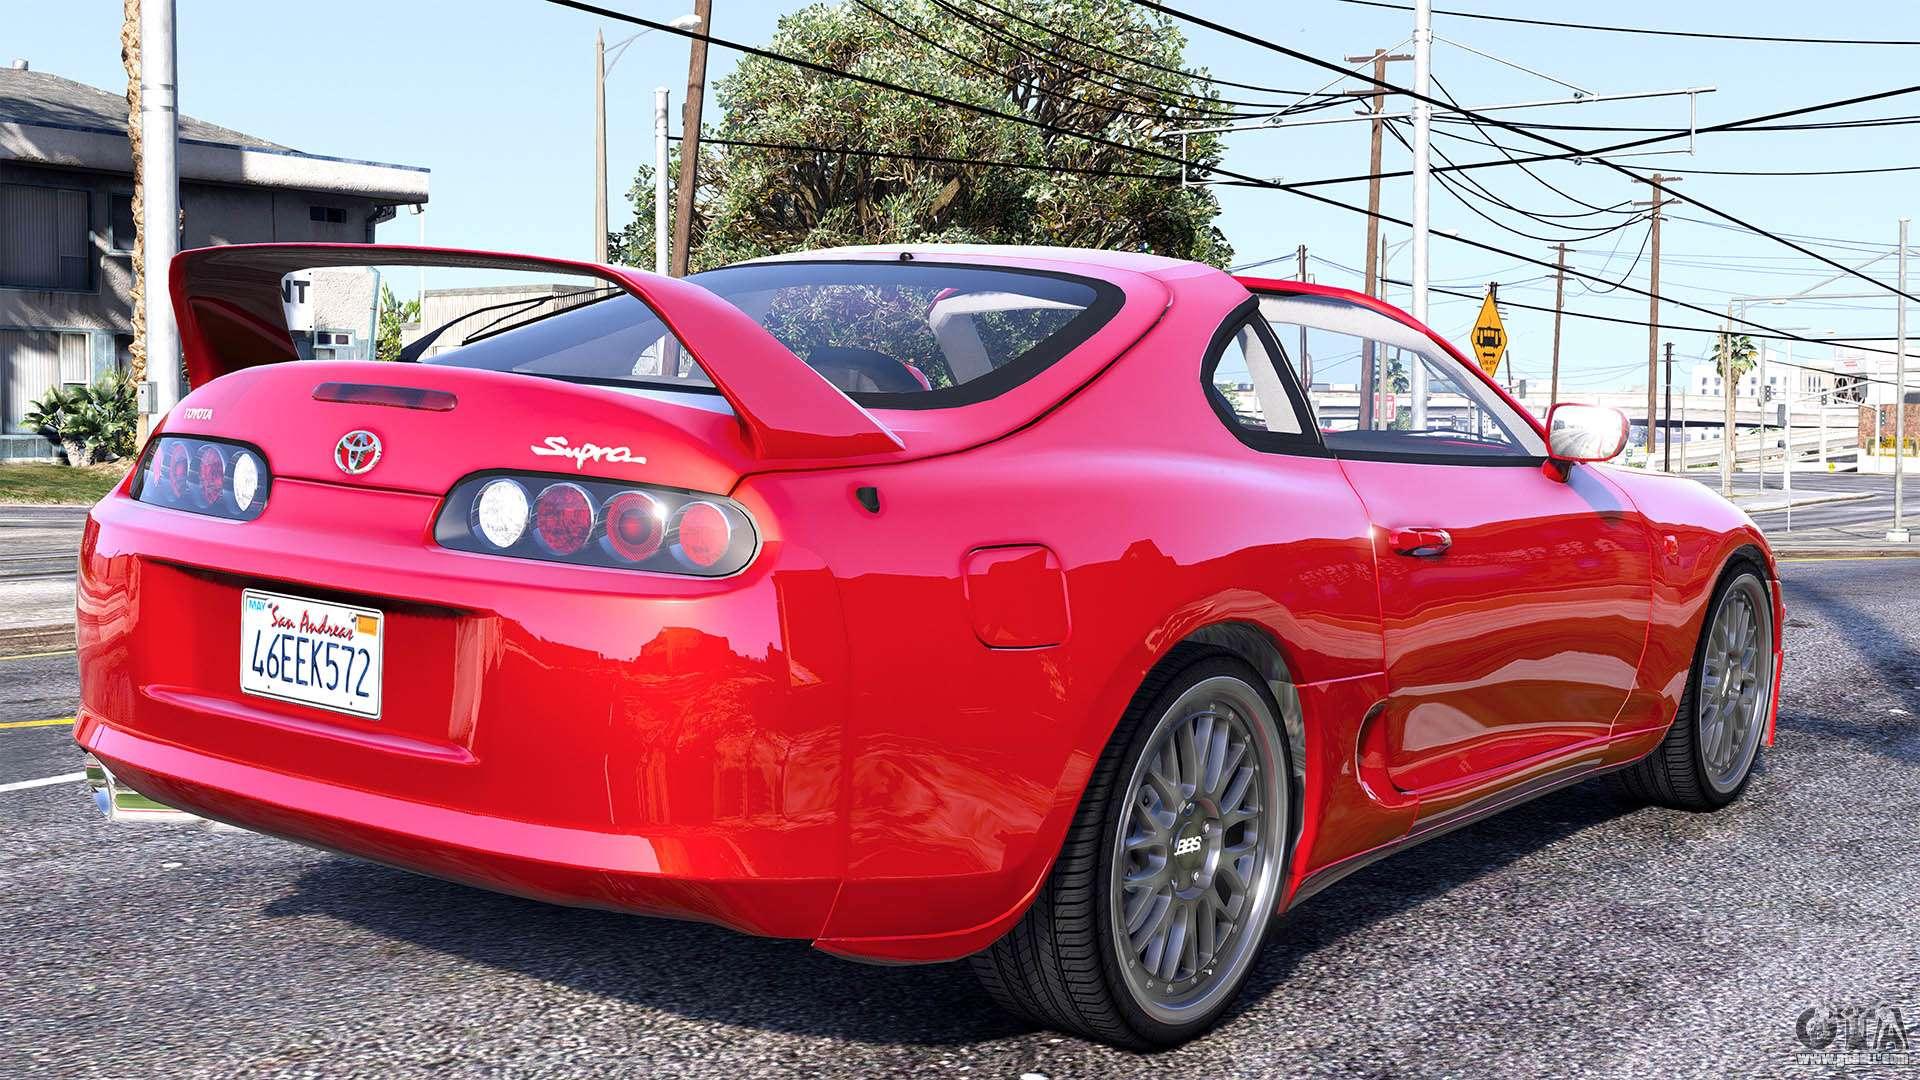 Gta 5 Toyota Supra >> Toyota Supra 1994 for GTA 5